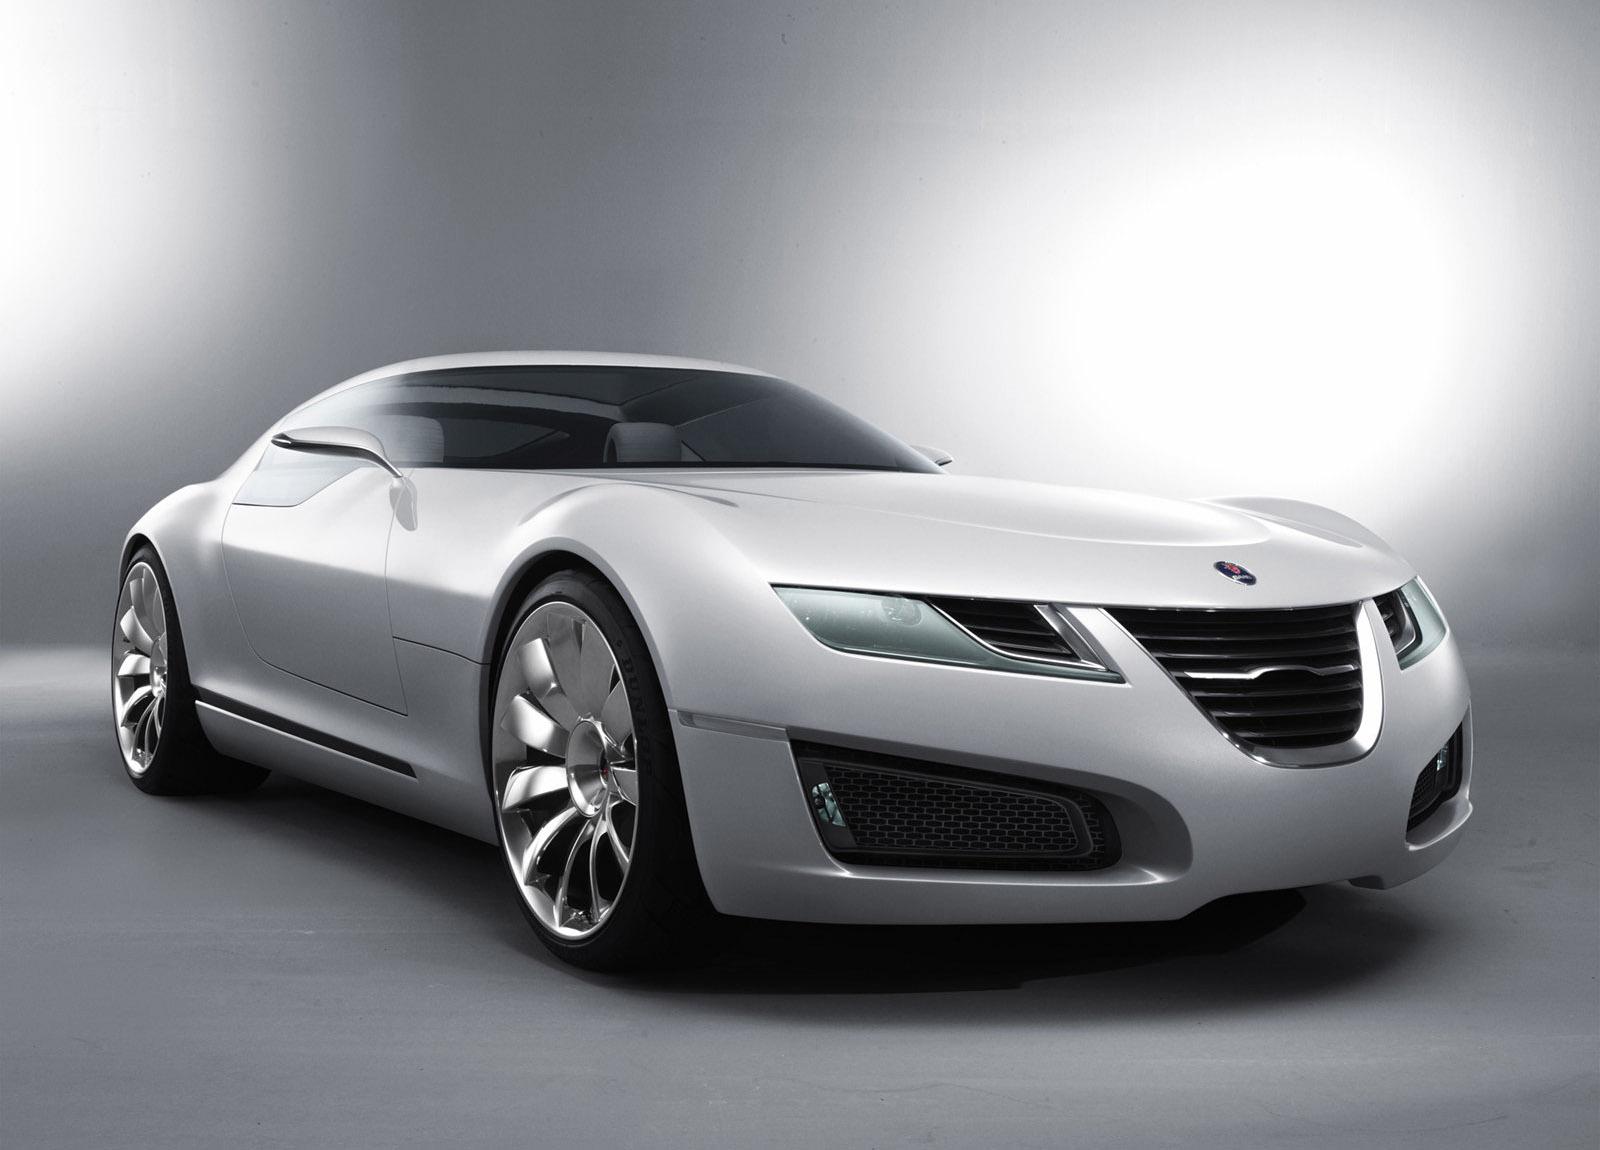 Saab Aero X Concept photo #1